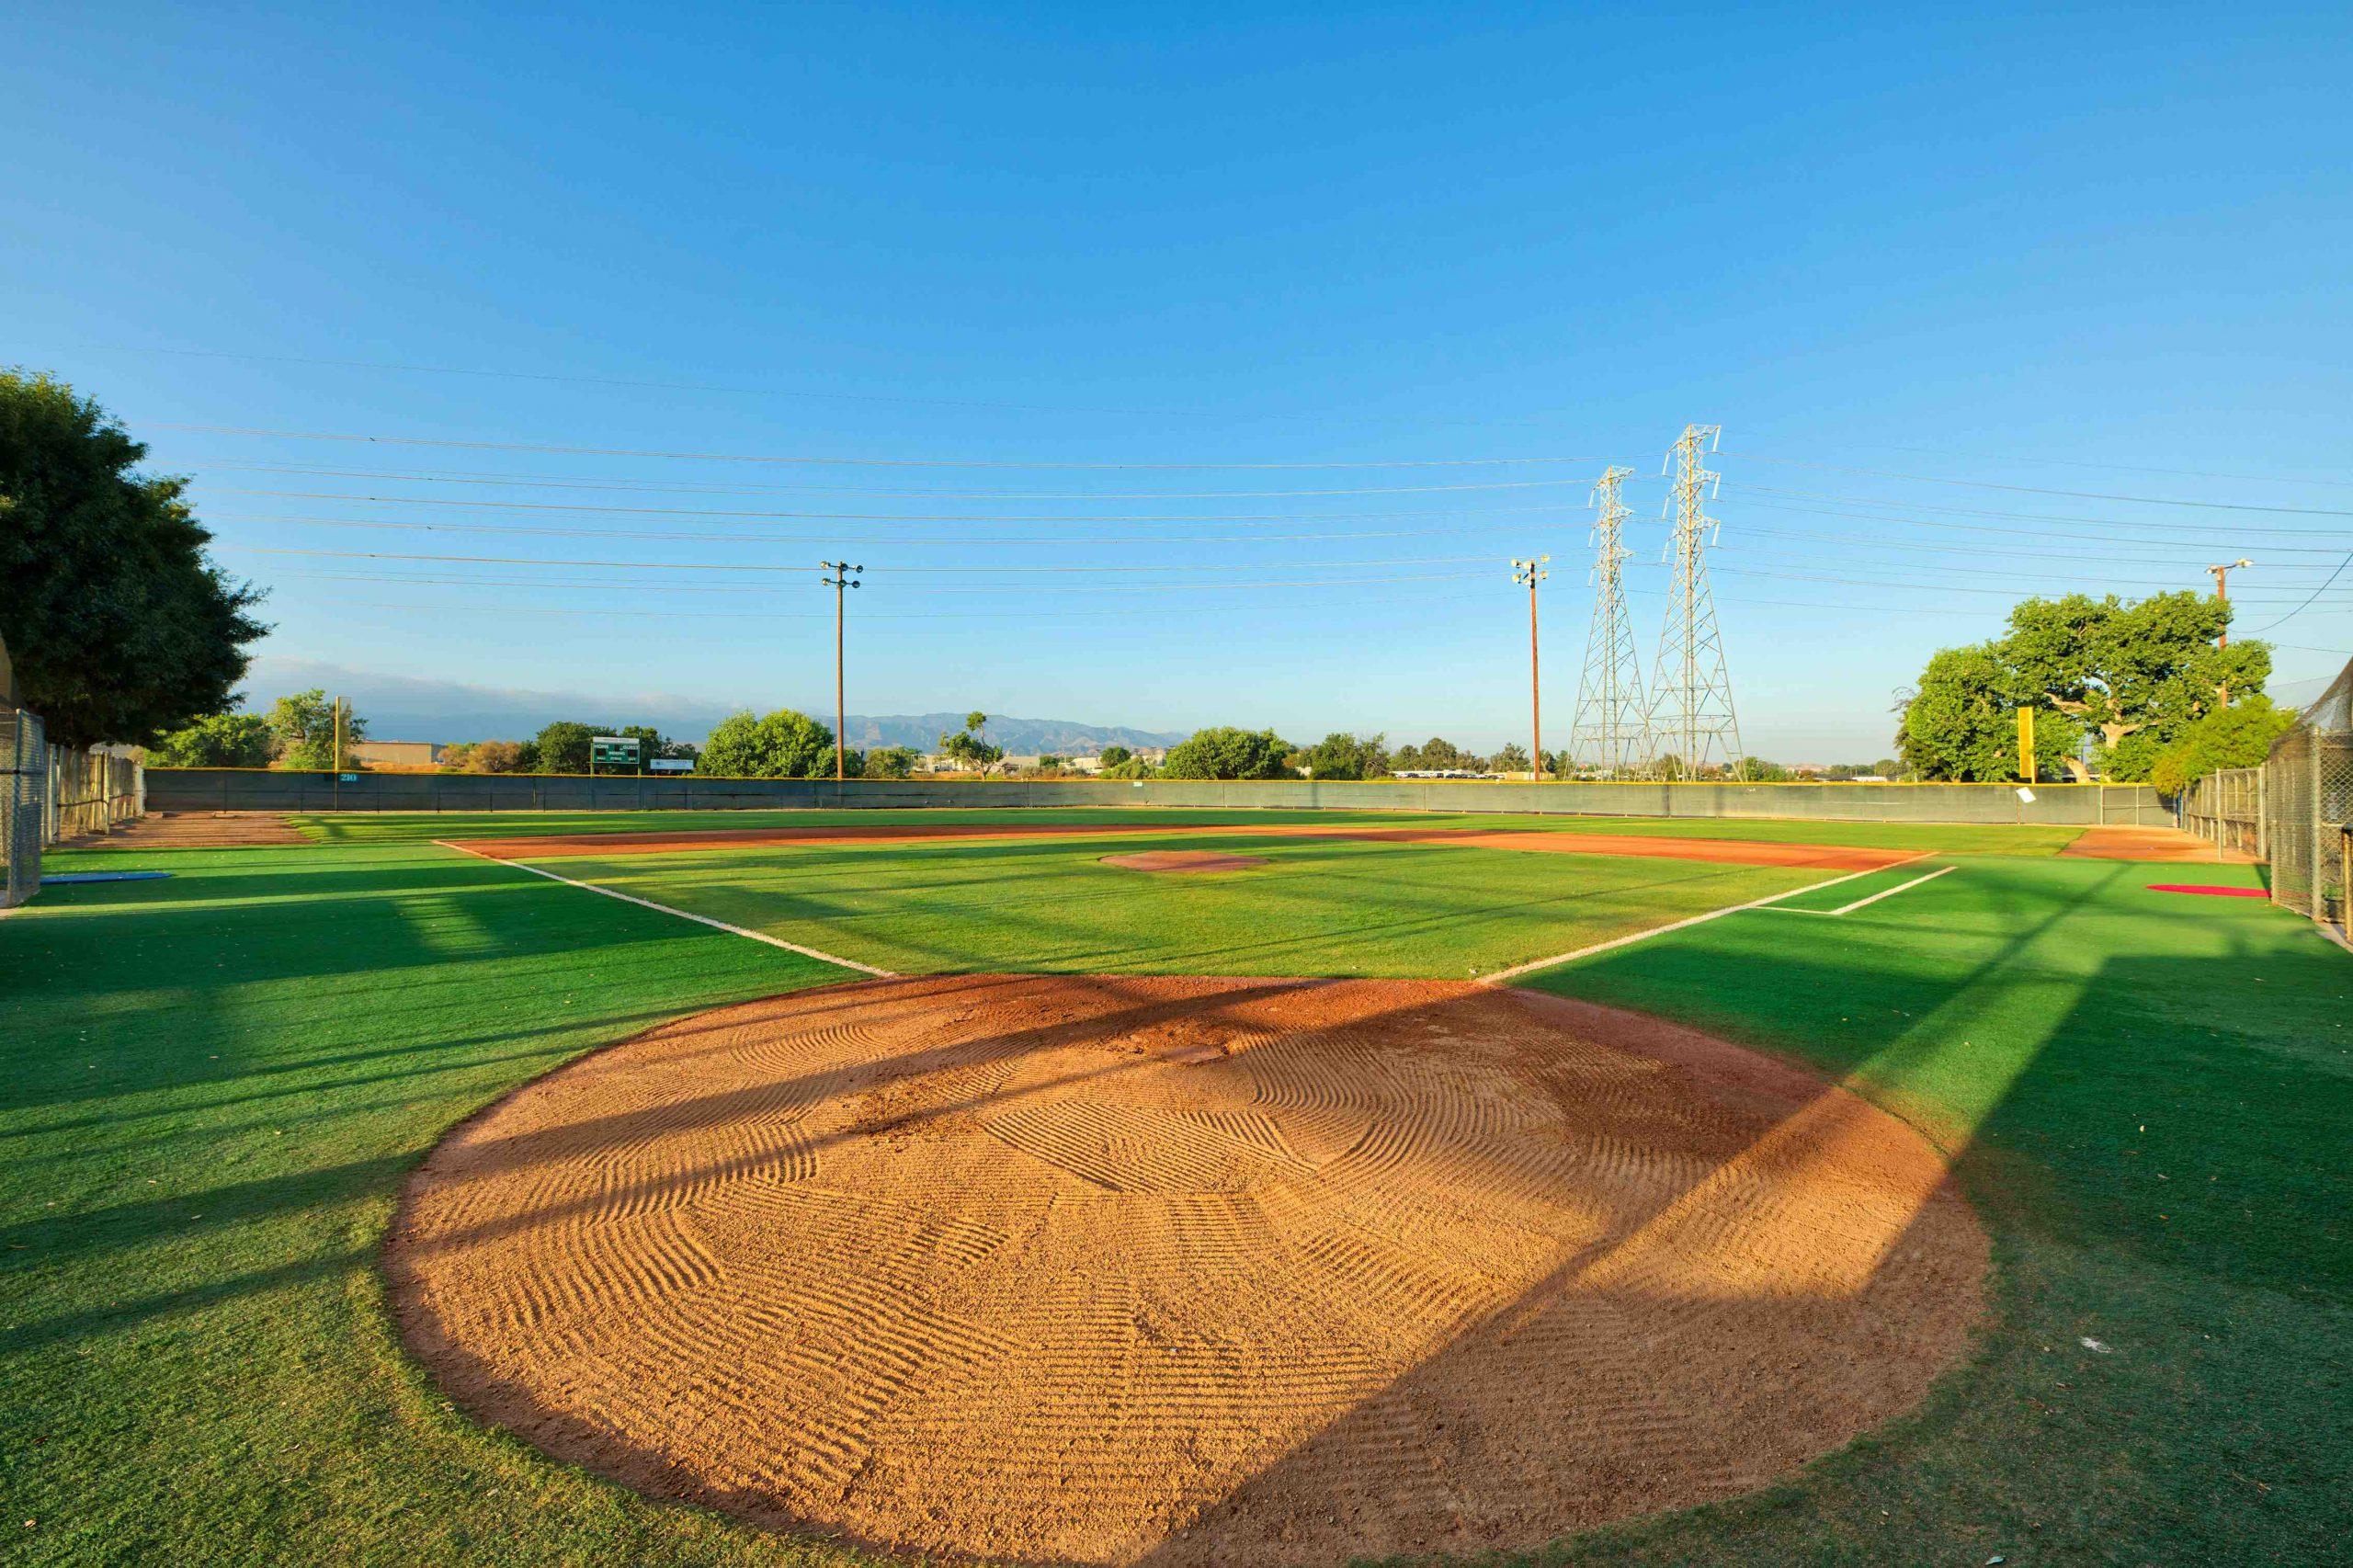 Baseball ground maintenance